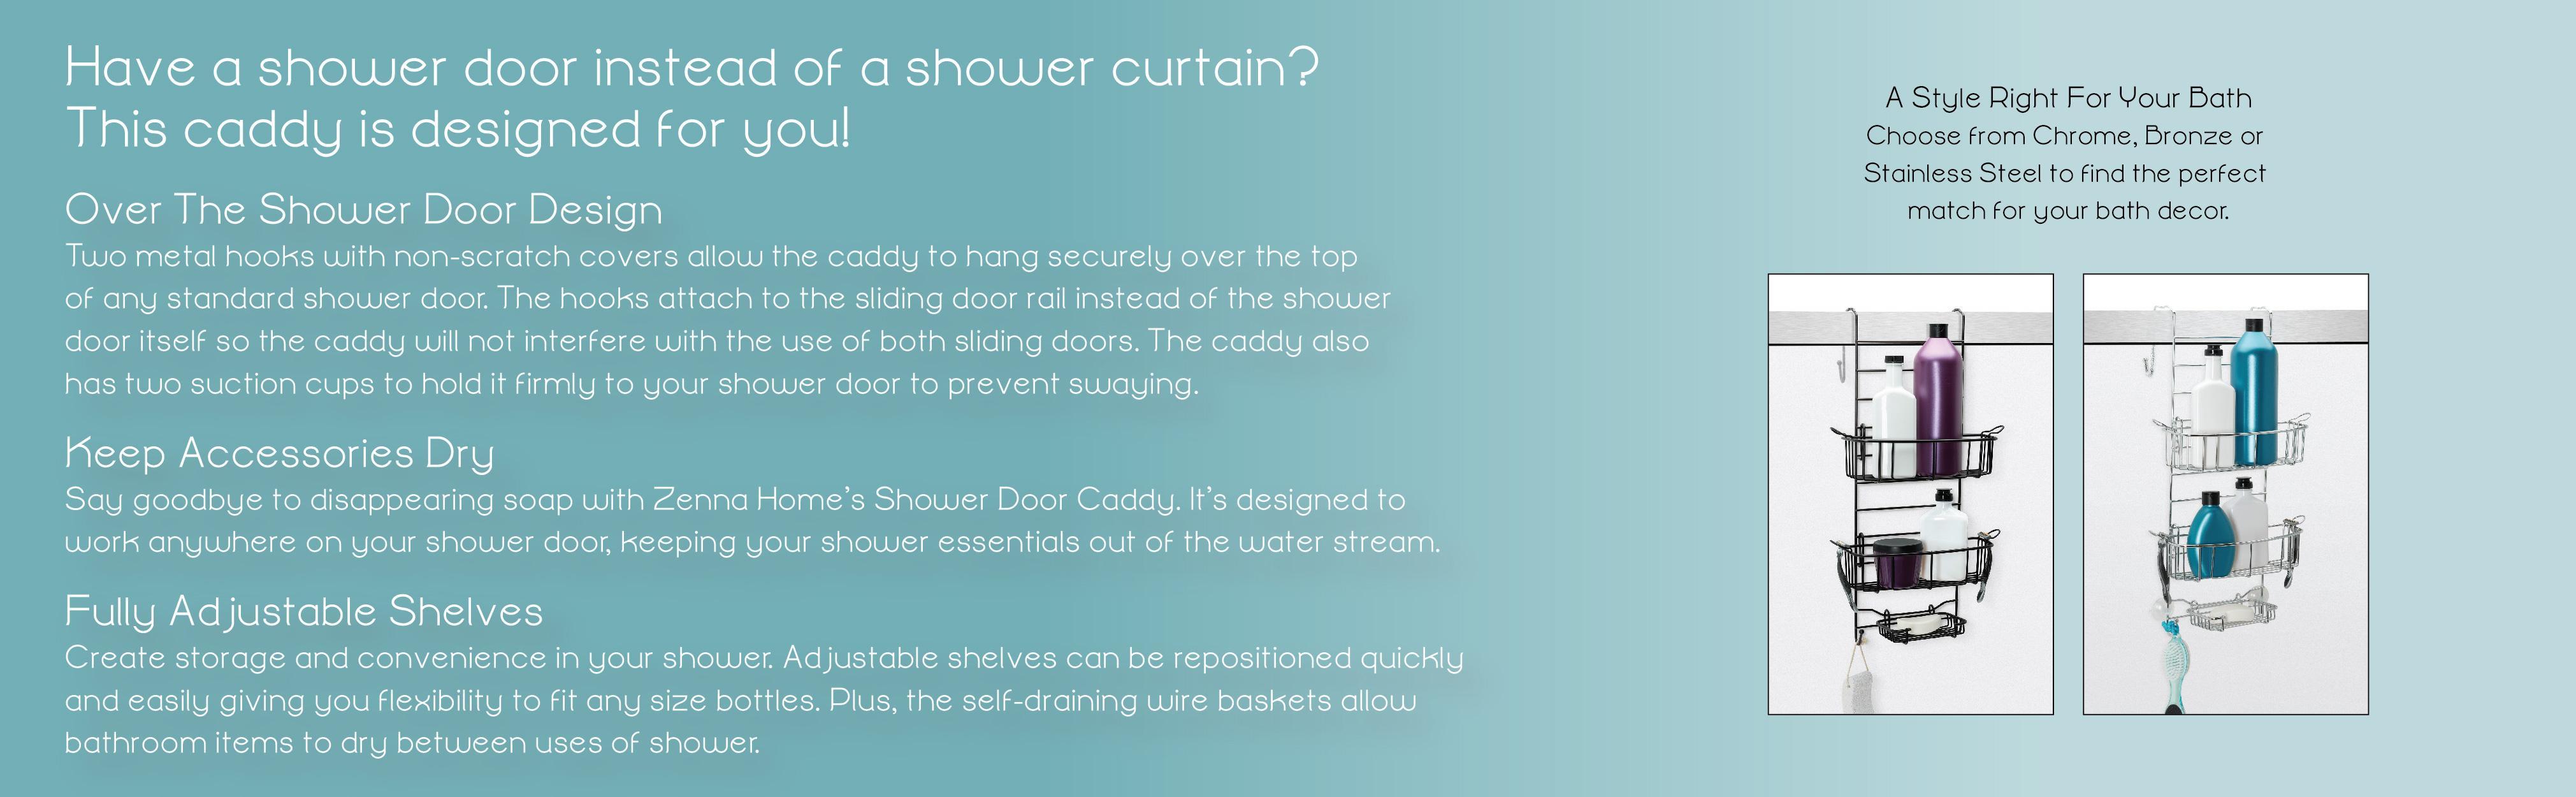 Modern Inter Over The Door Shower Caddy Inspiration - Bathtub Ideas ...